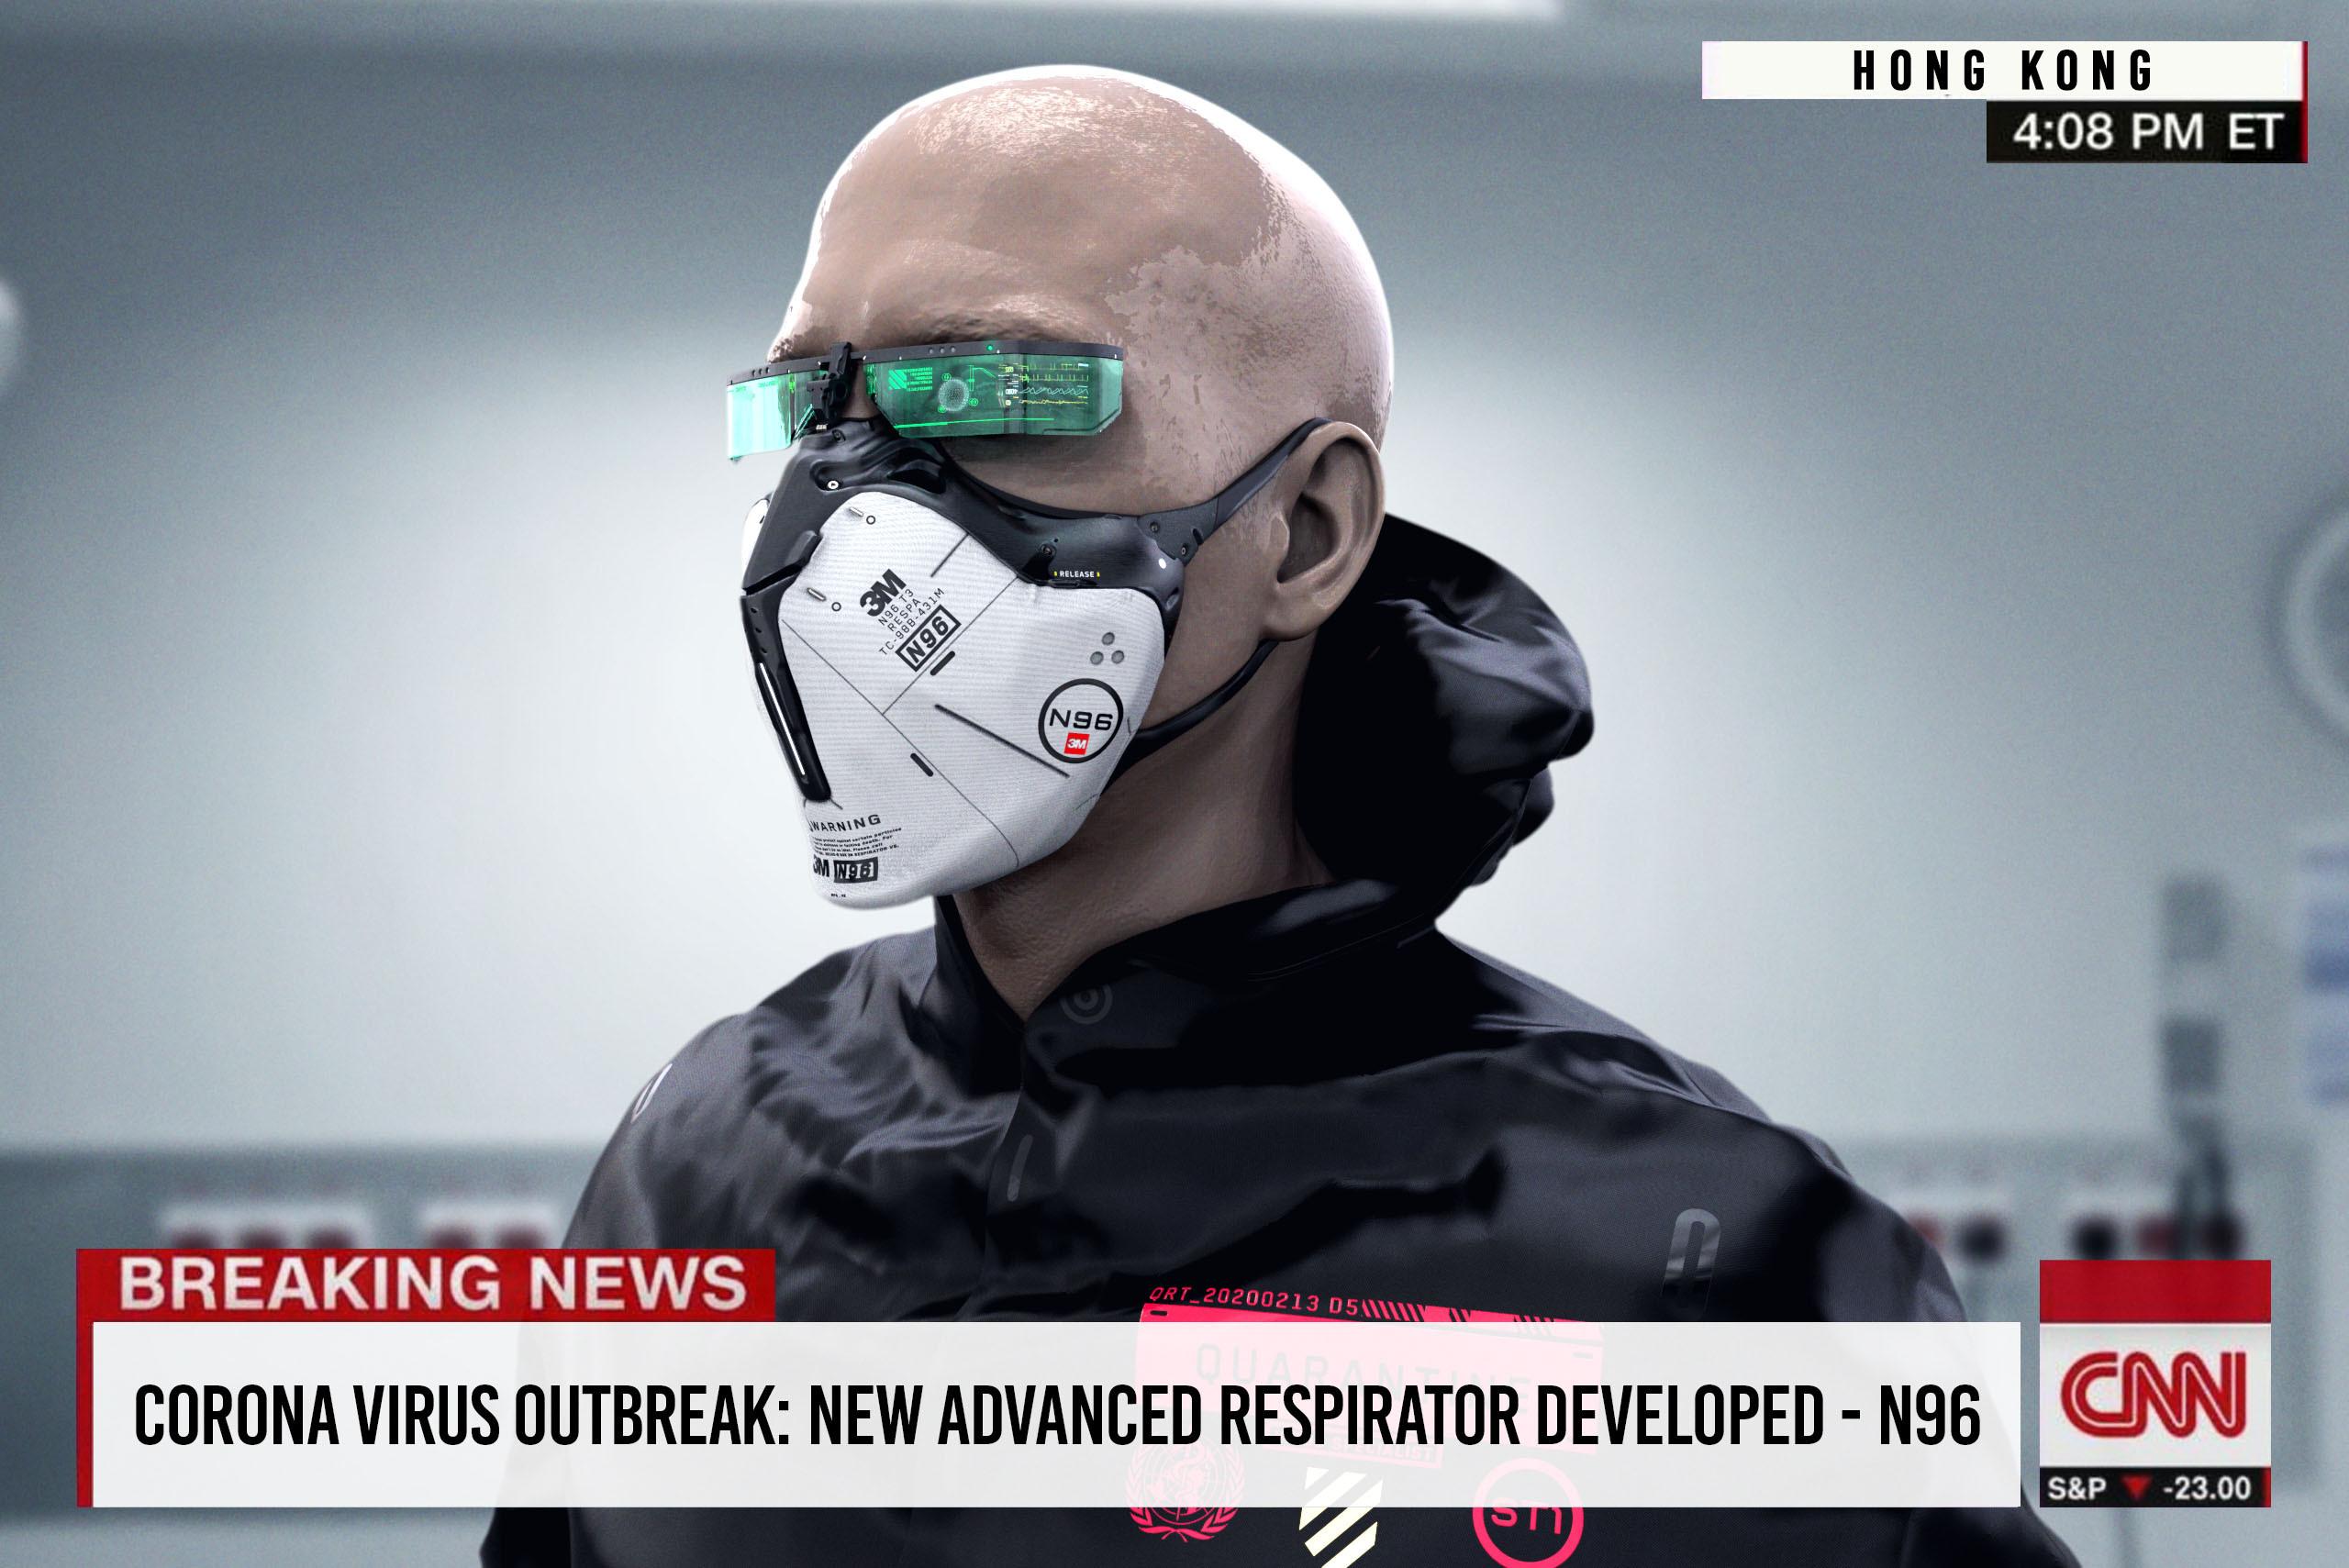 The N96 respirator